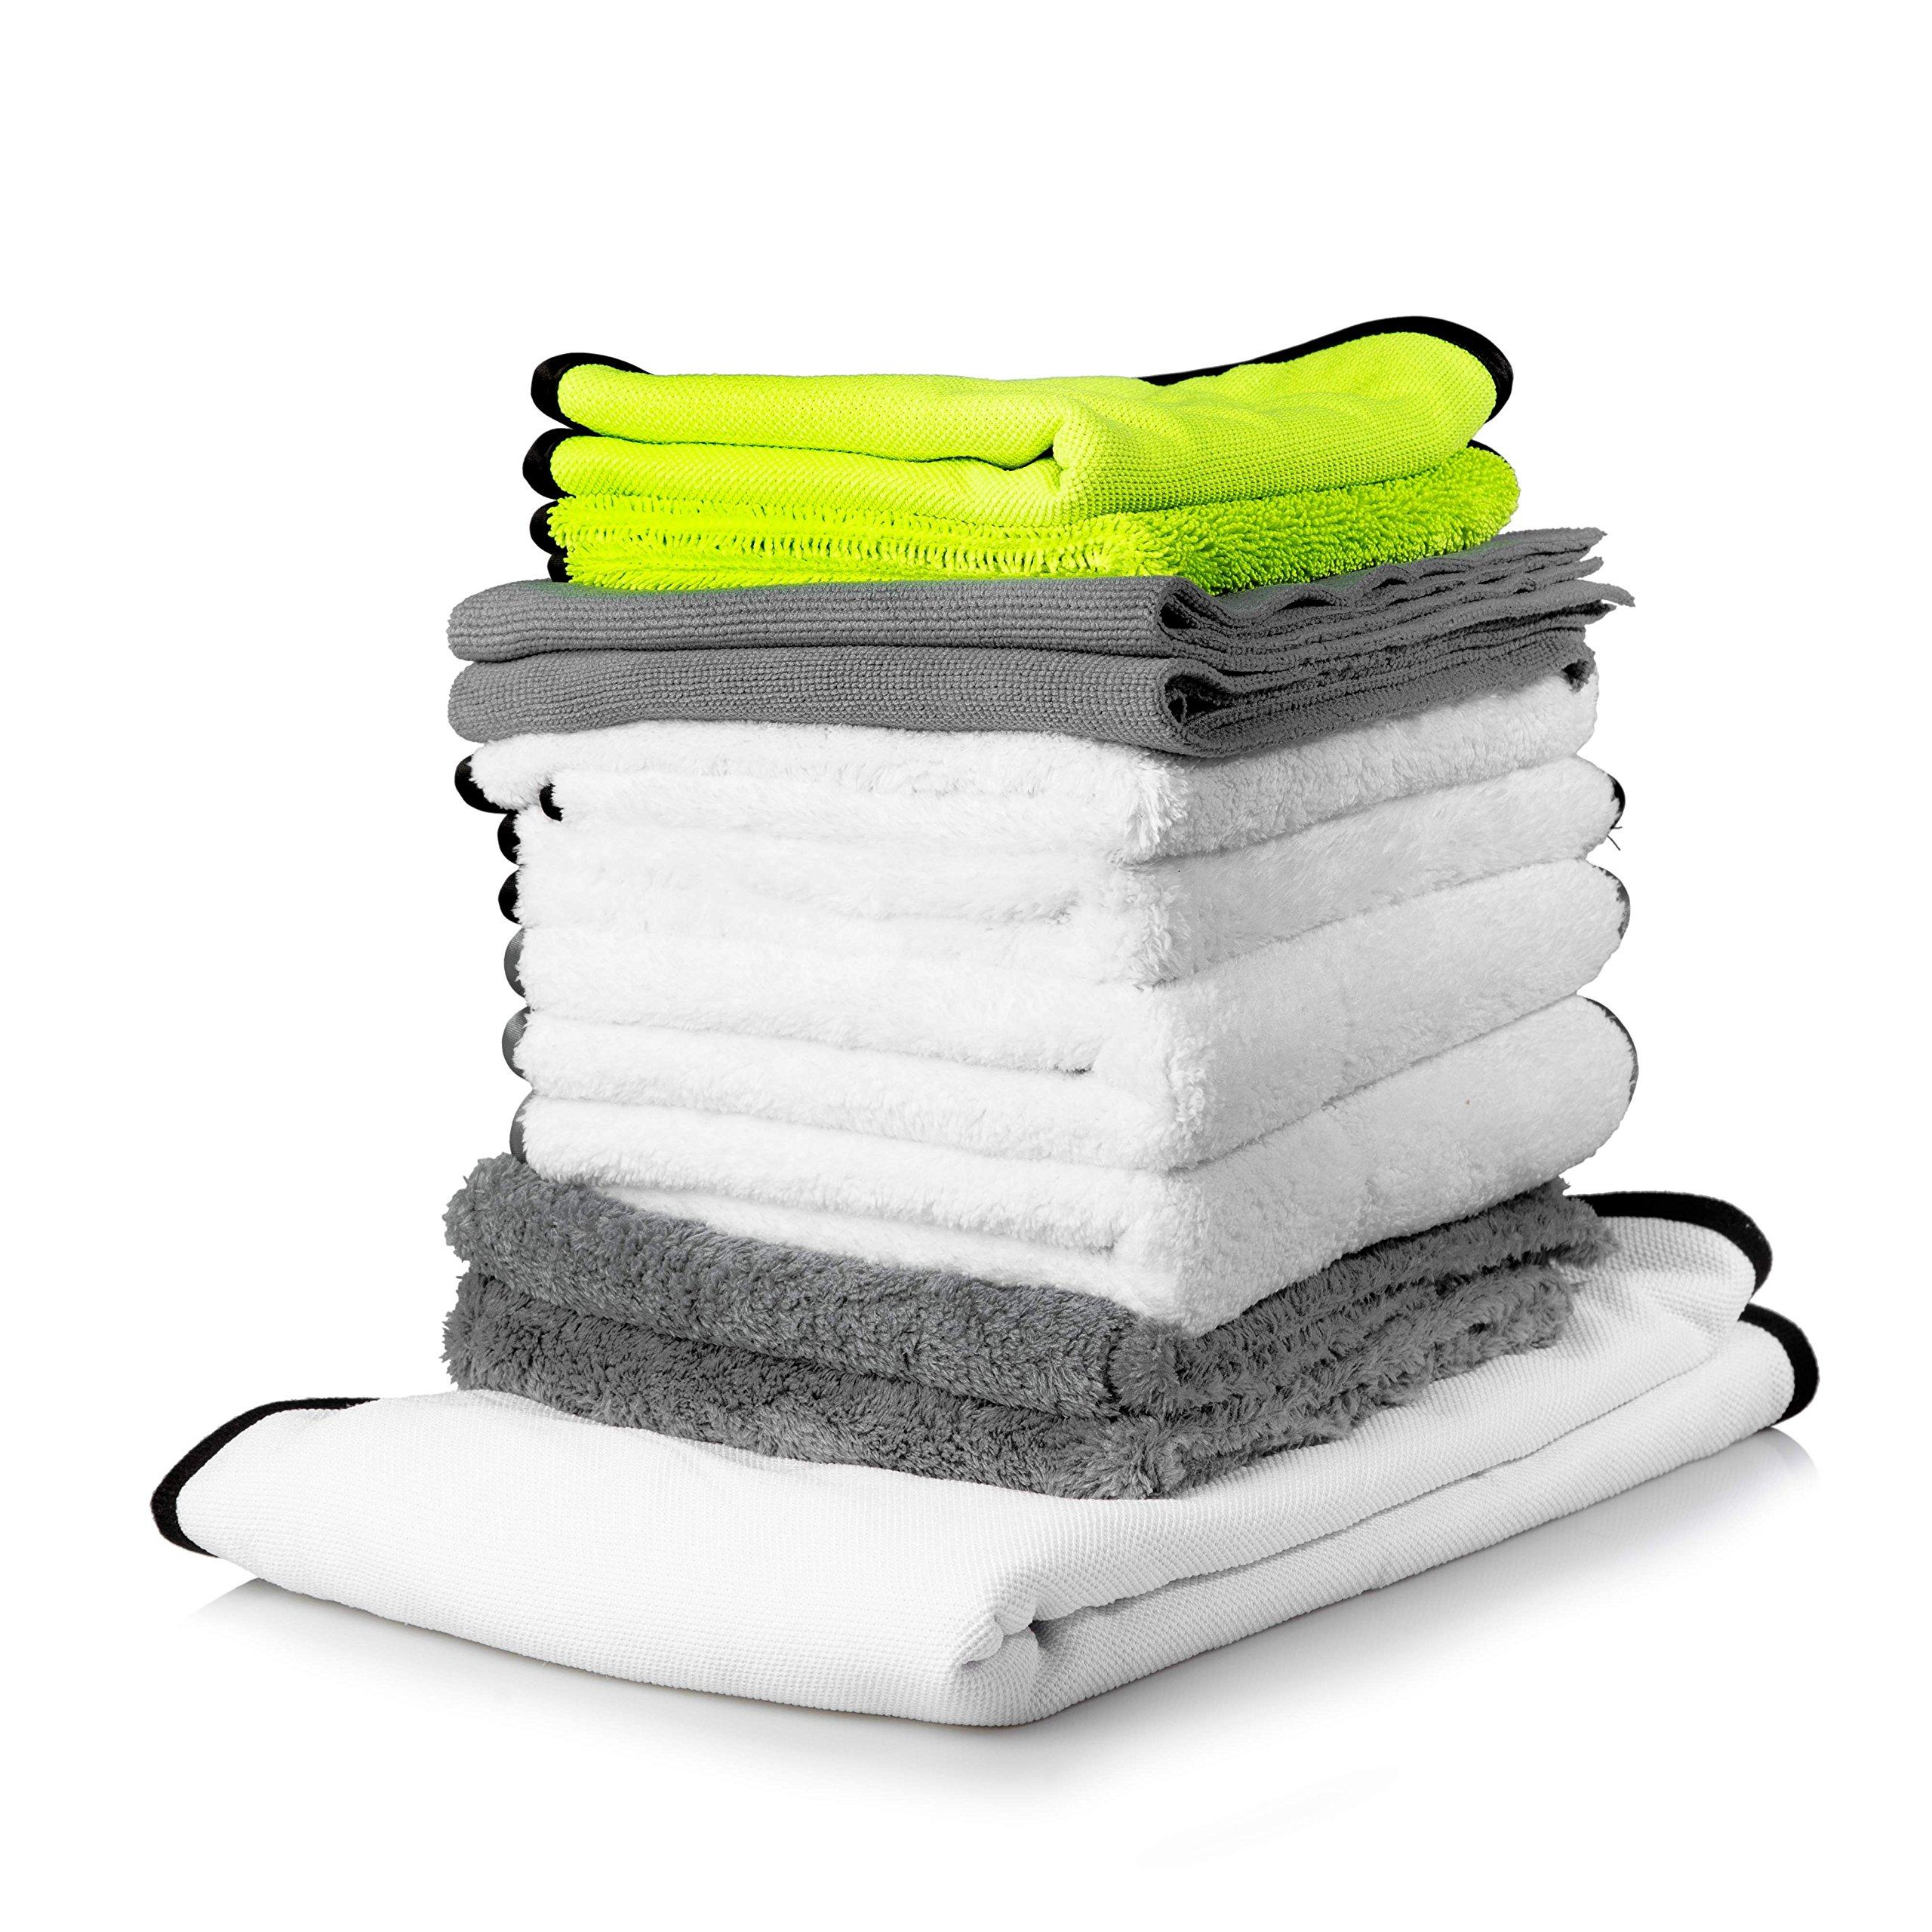 Adam's Microfiber Bundle - Great Kit to Restock on Microfiber - All of Our Bestselling Microfiber Towels (Complete Bundle)